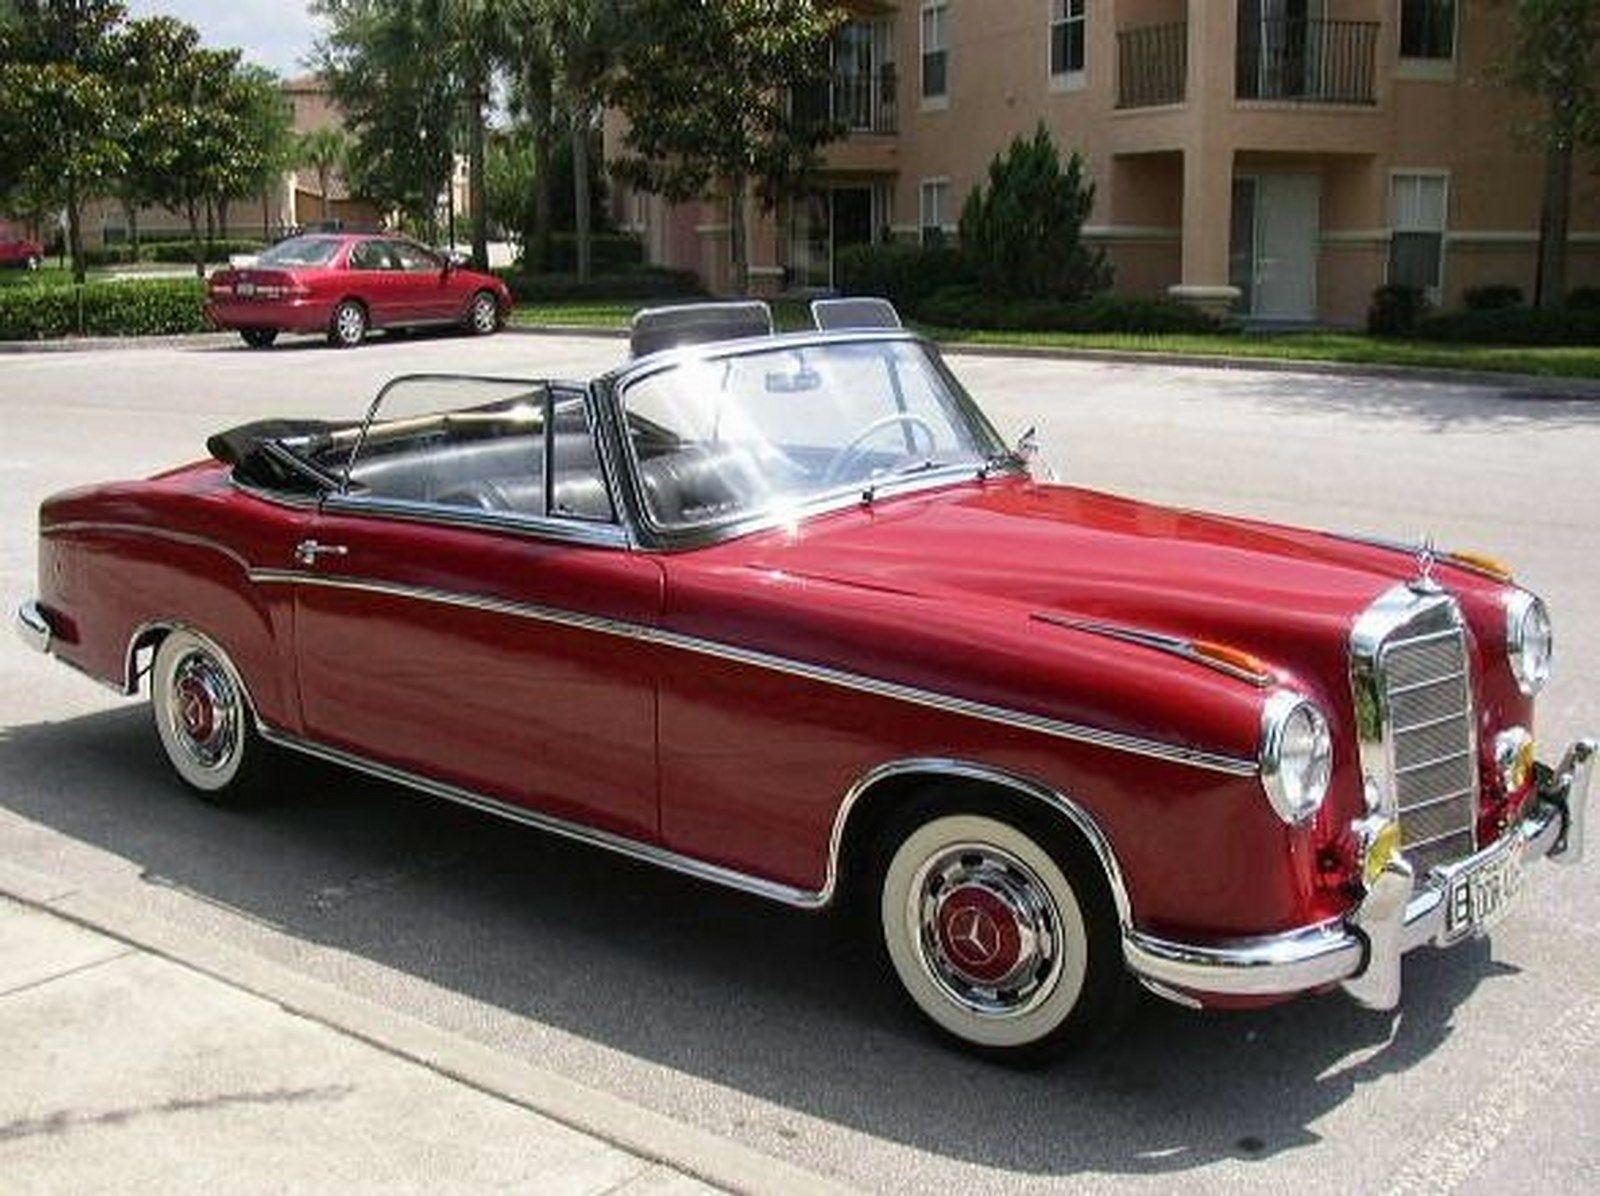 1957 mercedes benz 220s cabriolet mercedes pinterest for Mercedes benz 220s